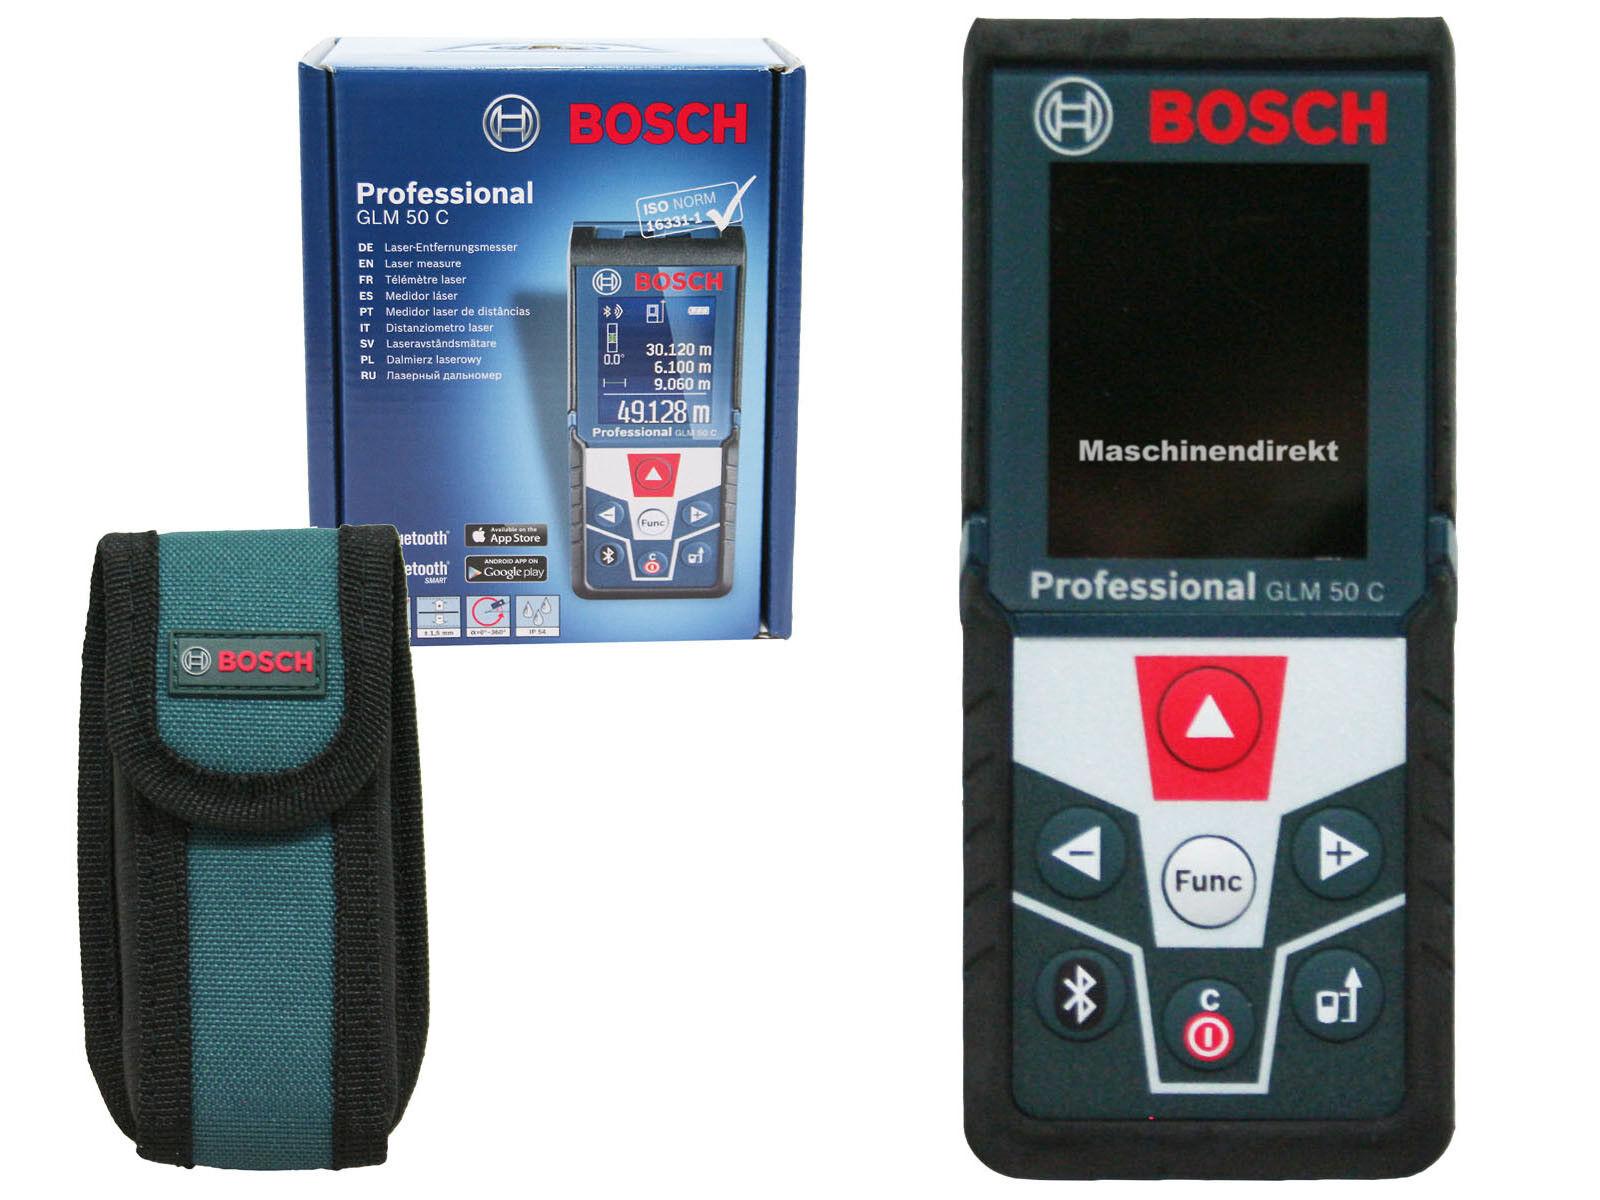 Bosch glm 50 c professional laser entfernungsmesser ebay